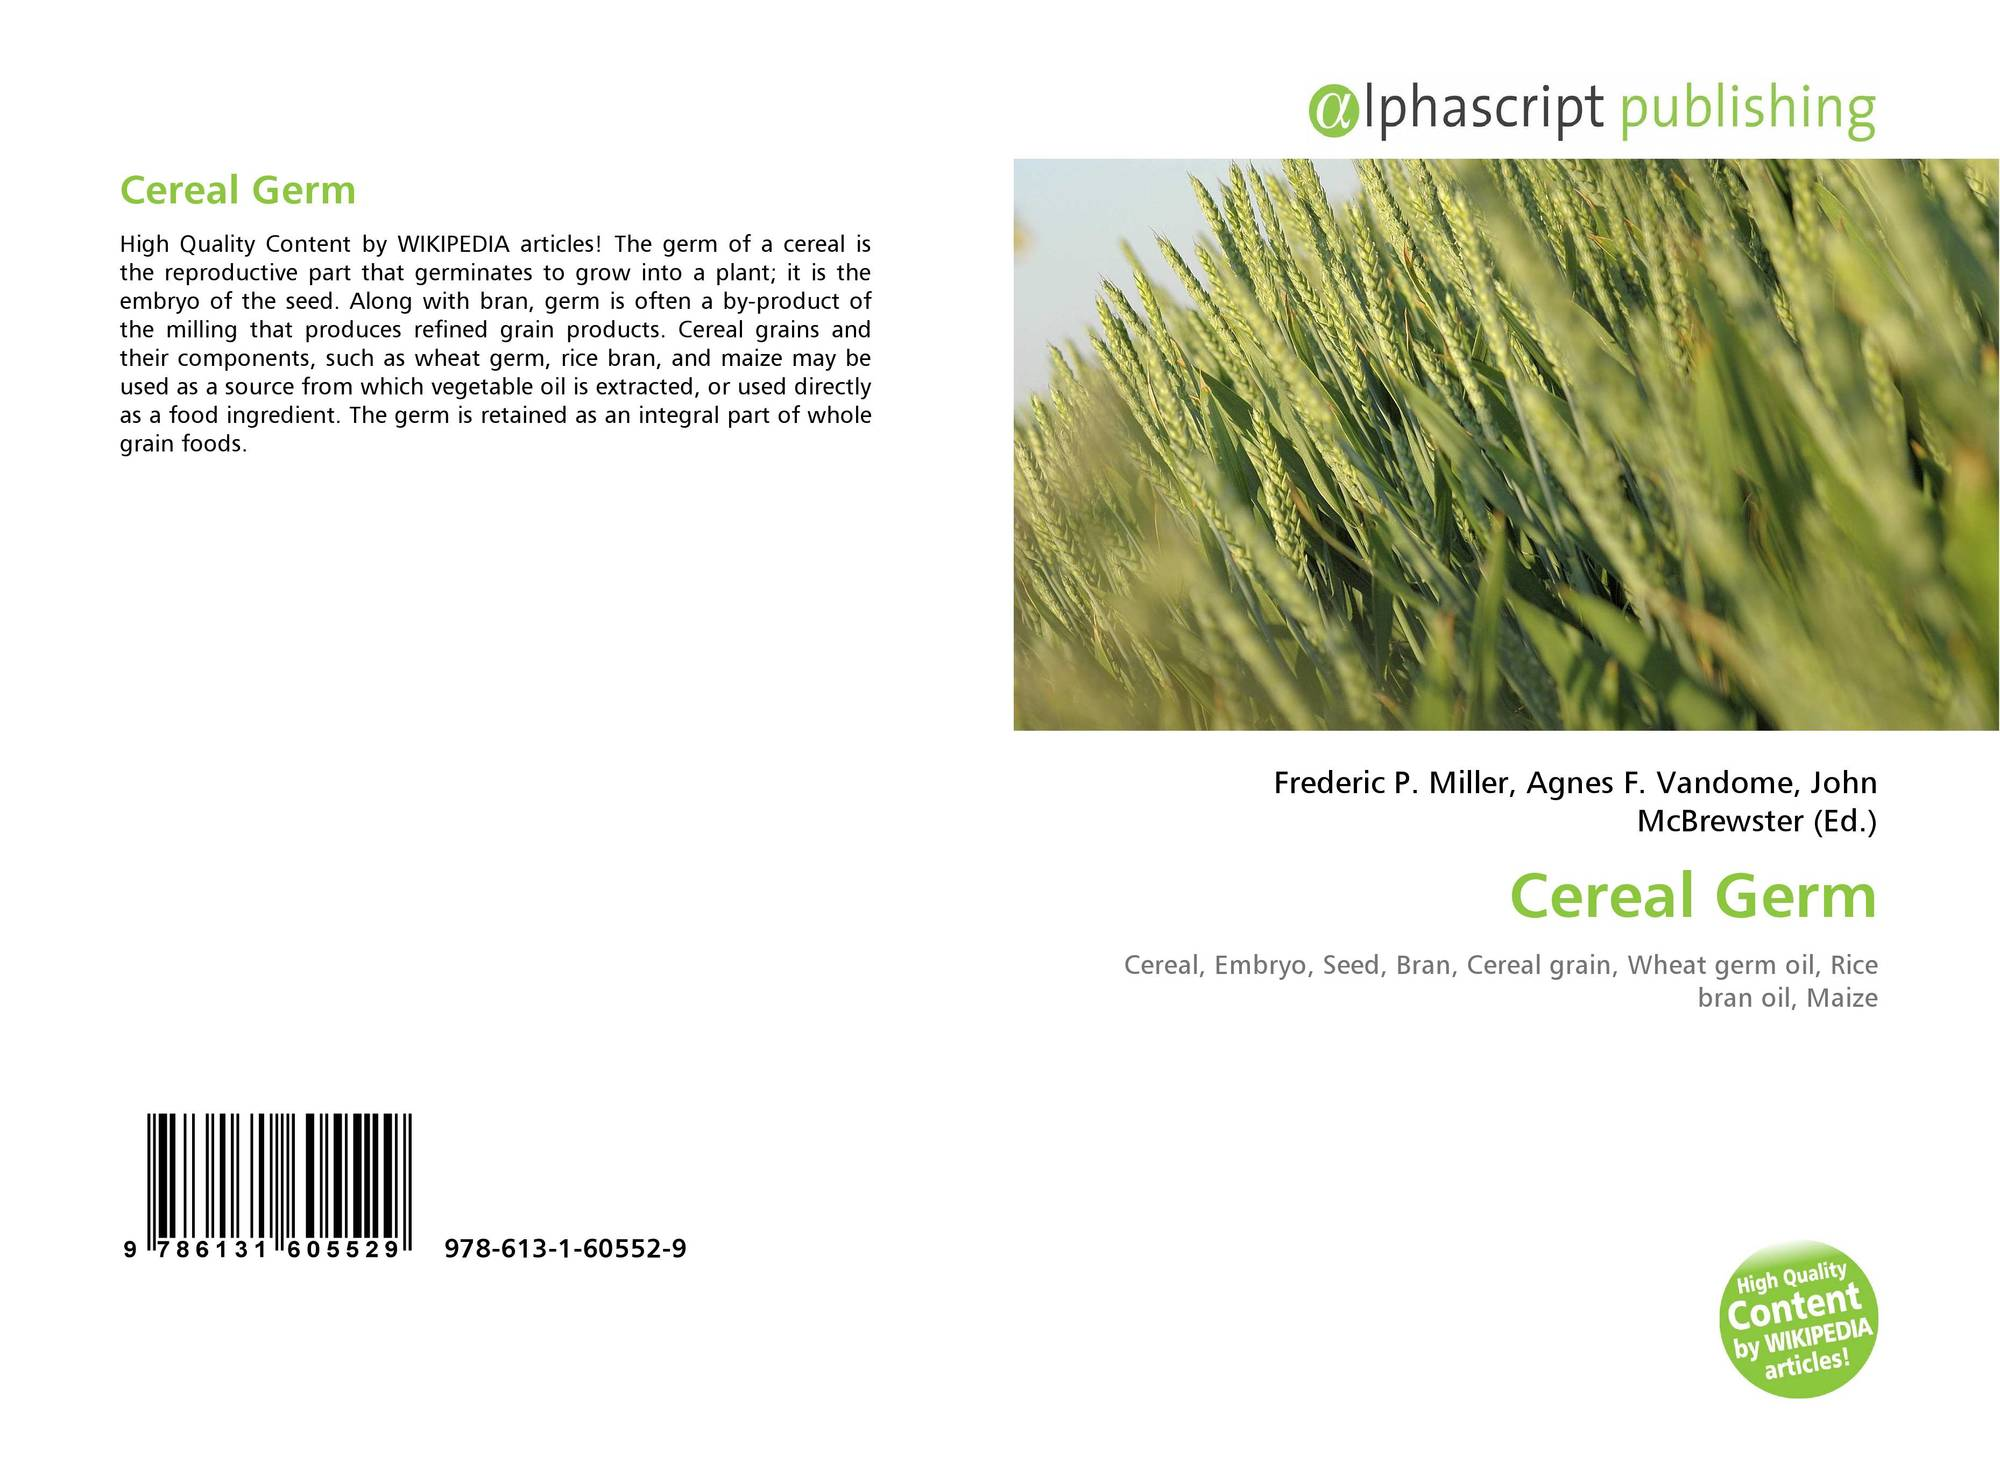 Cereal Germ, 978-613-1-60552-9, 6131605521 ,9786131605529